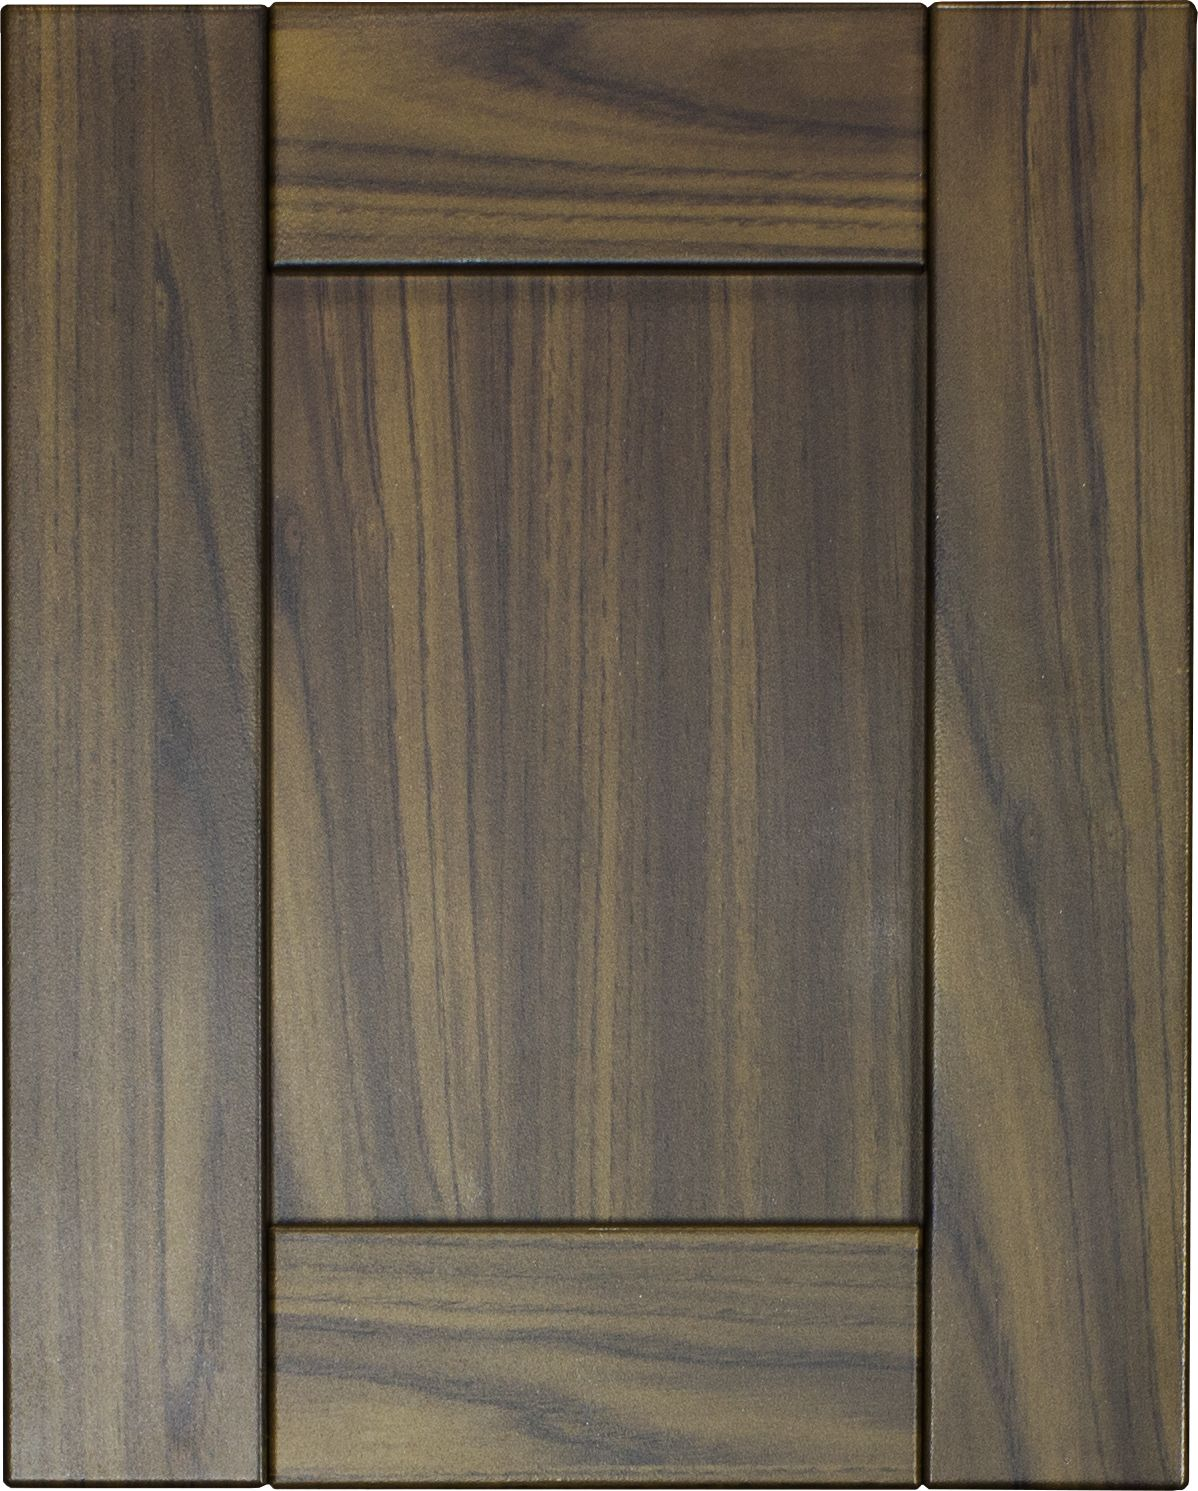 Stainless Steel Cabinet Doors Stainless Steel Cabinets Cabinet Door Styles Outdoor Kitchen Cabinets